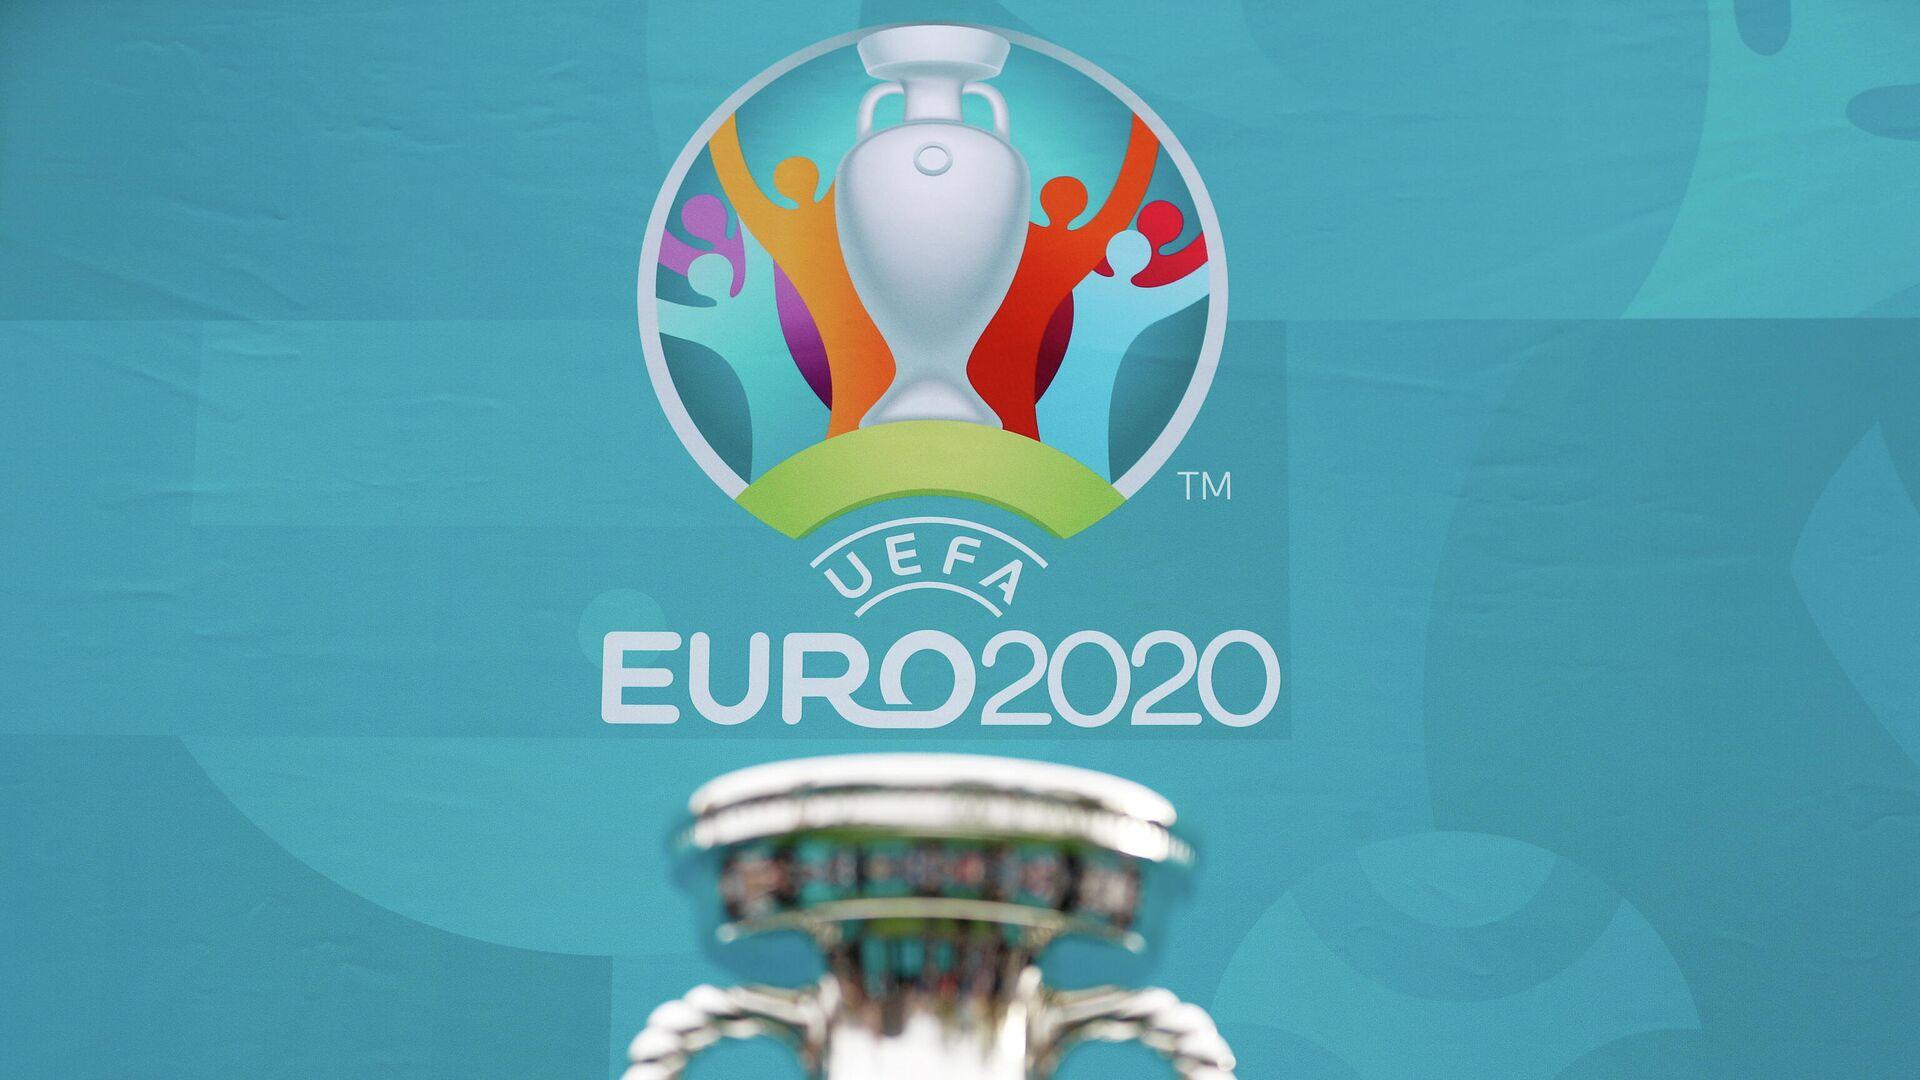 Логотип Евро-2020 - РИА Новости, 1920, 16.06.2021